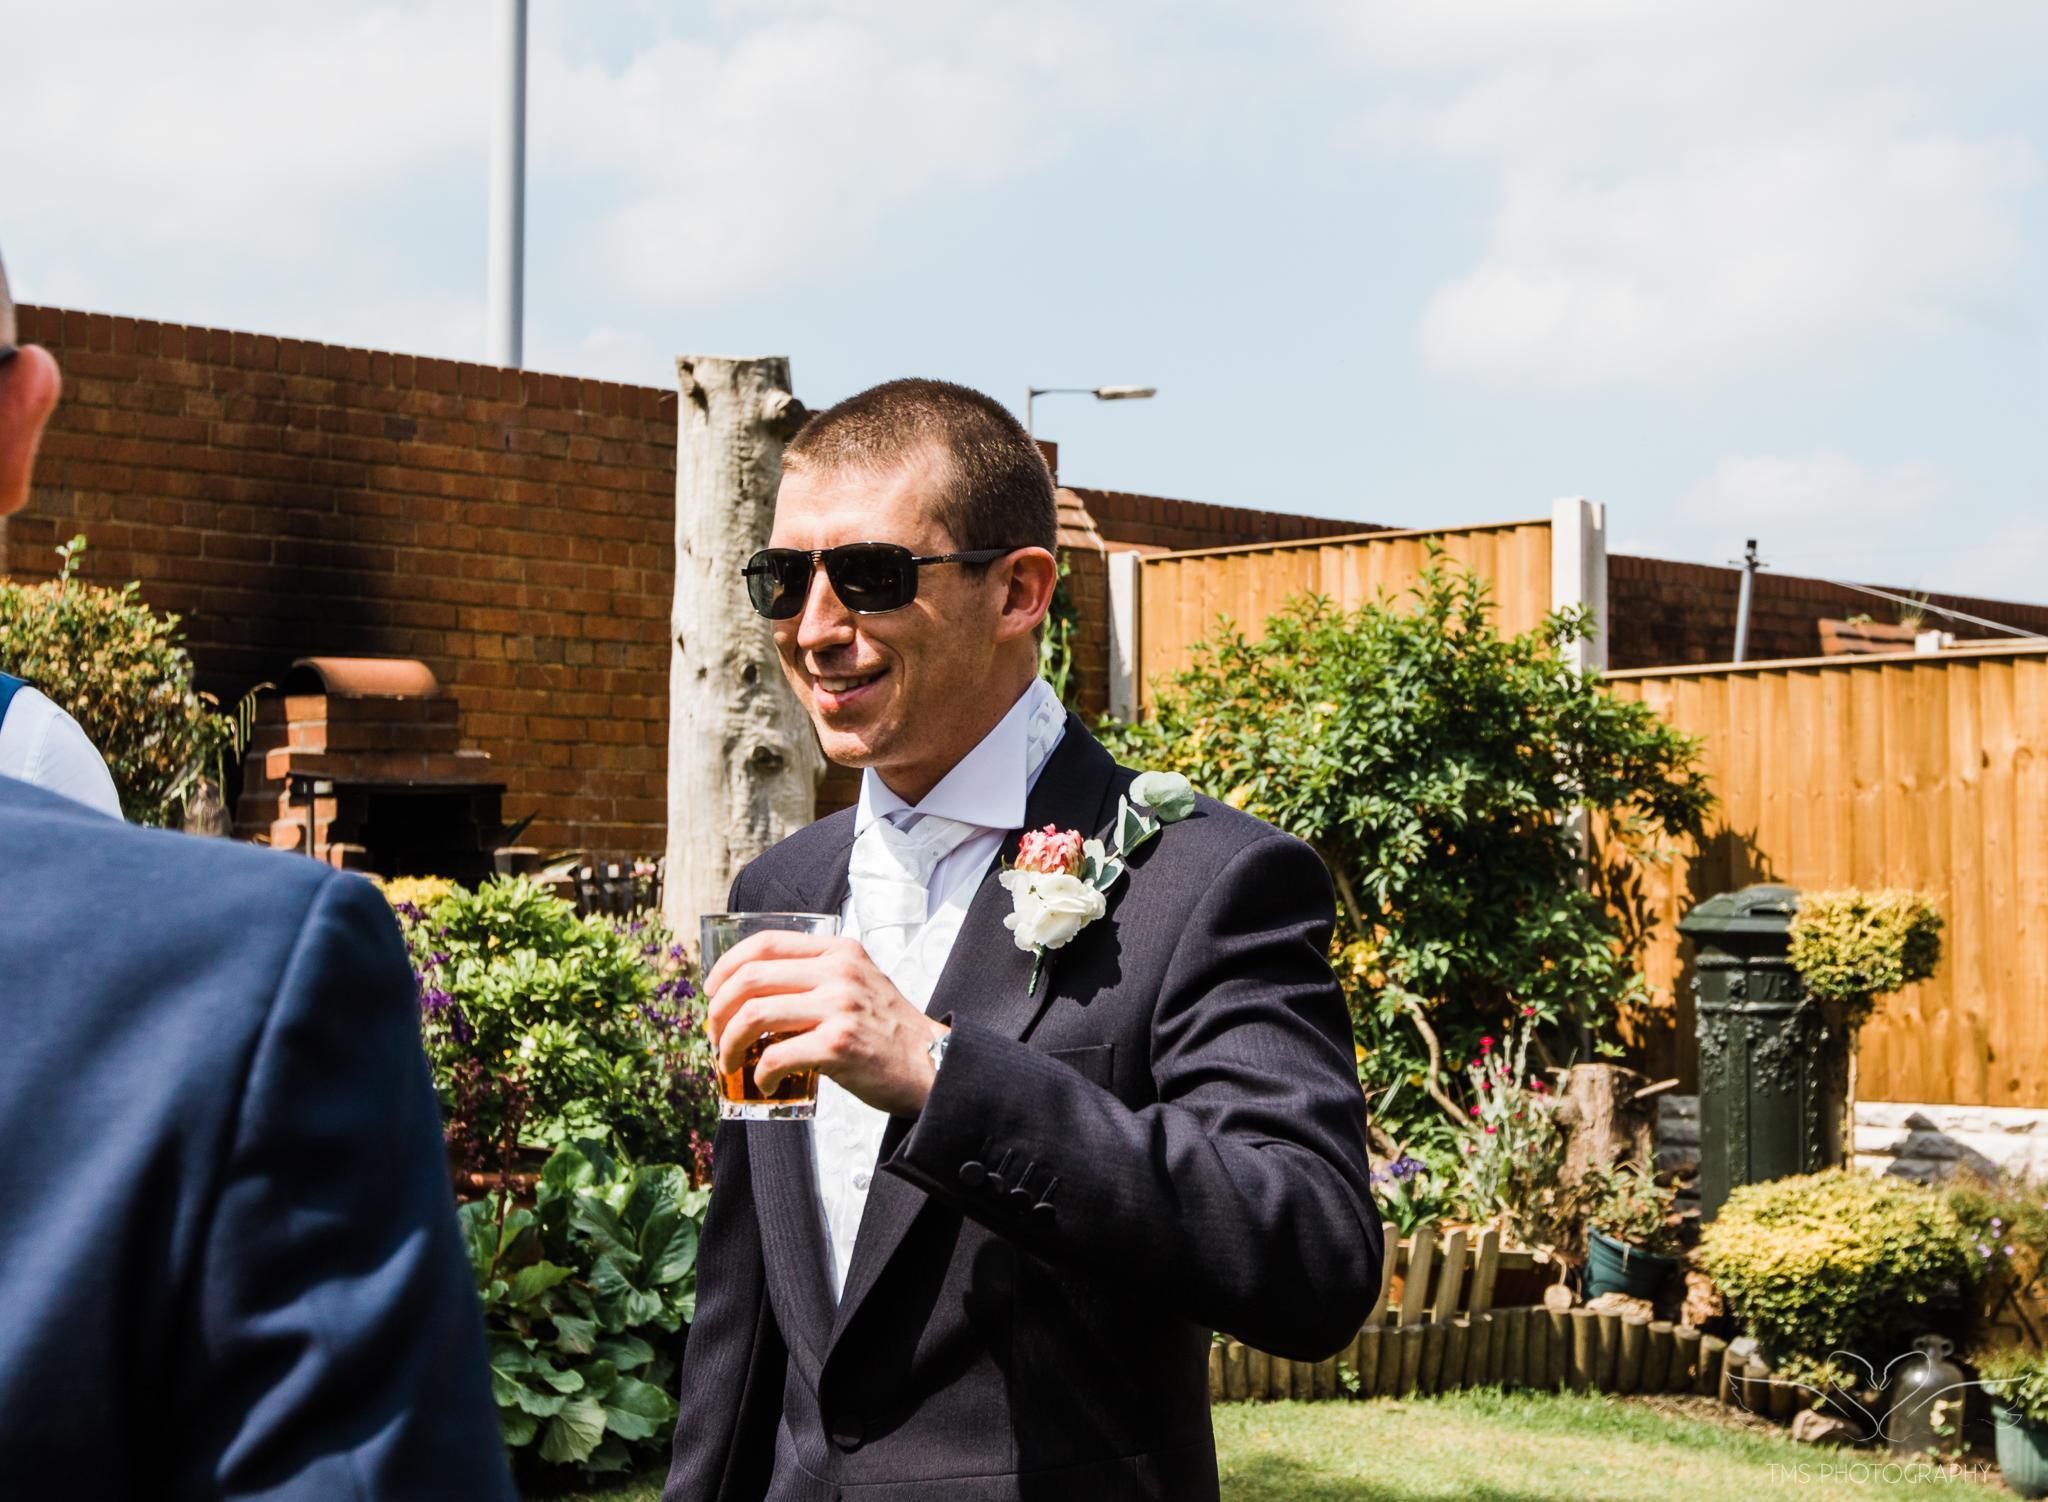 Wedding_photography_Hilton_liverpool_Albertdocks-39